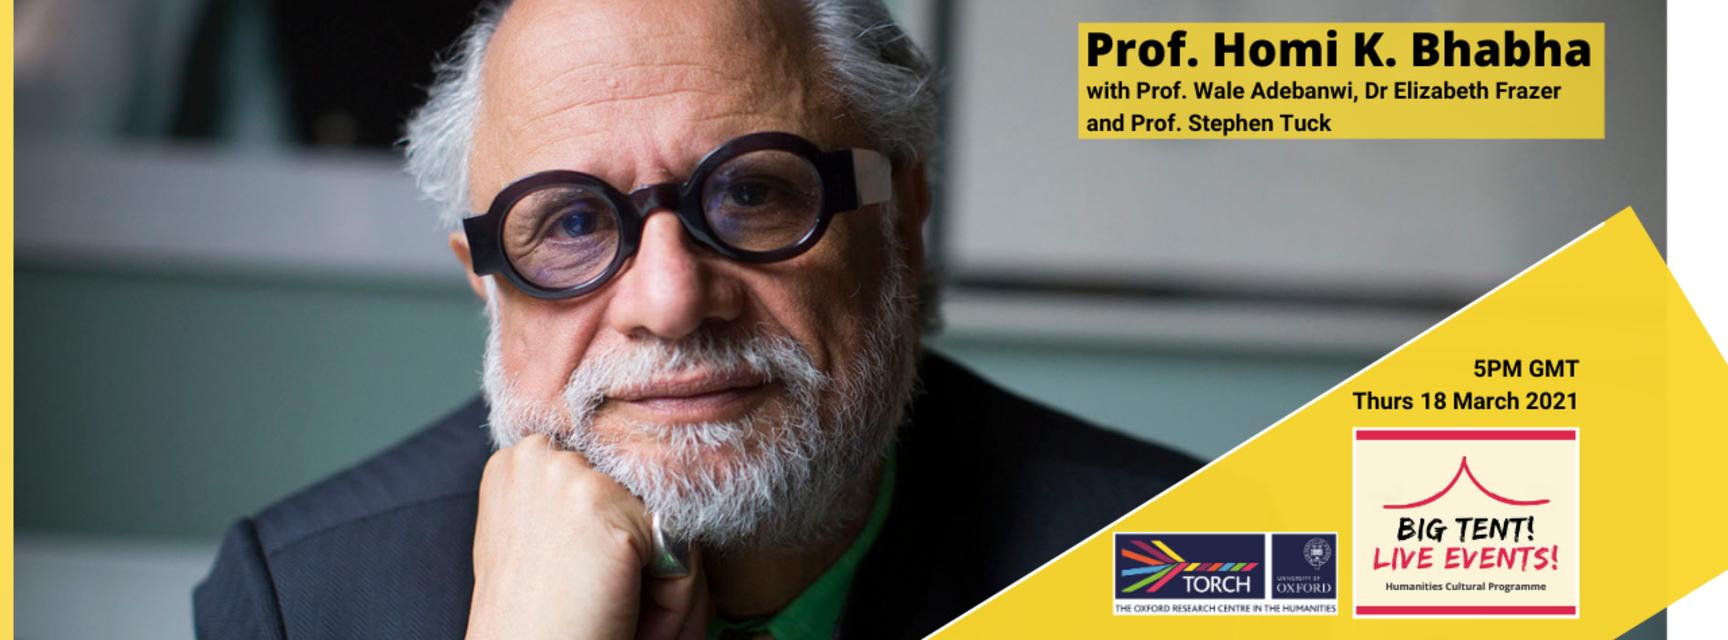 Photo of Professor Homi Bhabha, overlaid with yellow boxes reading 'Prof Homi K. Bhabha with Prof Elizabeth Frazer, Prof Wale Adebanwi, and Professor Stephen Tuck. 5PM GMT, Thurs 18 March.'